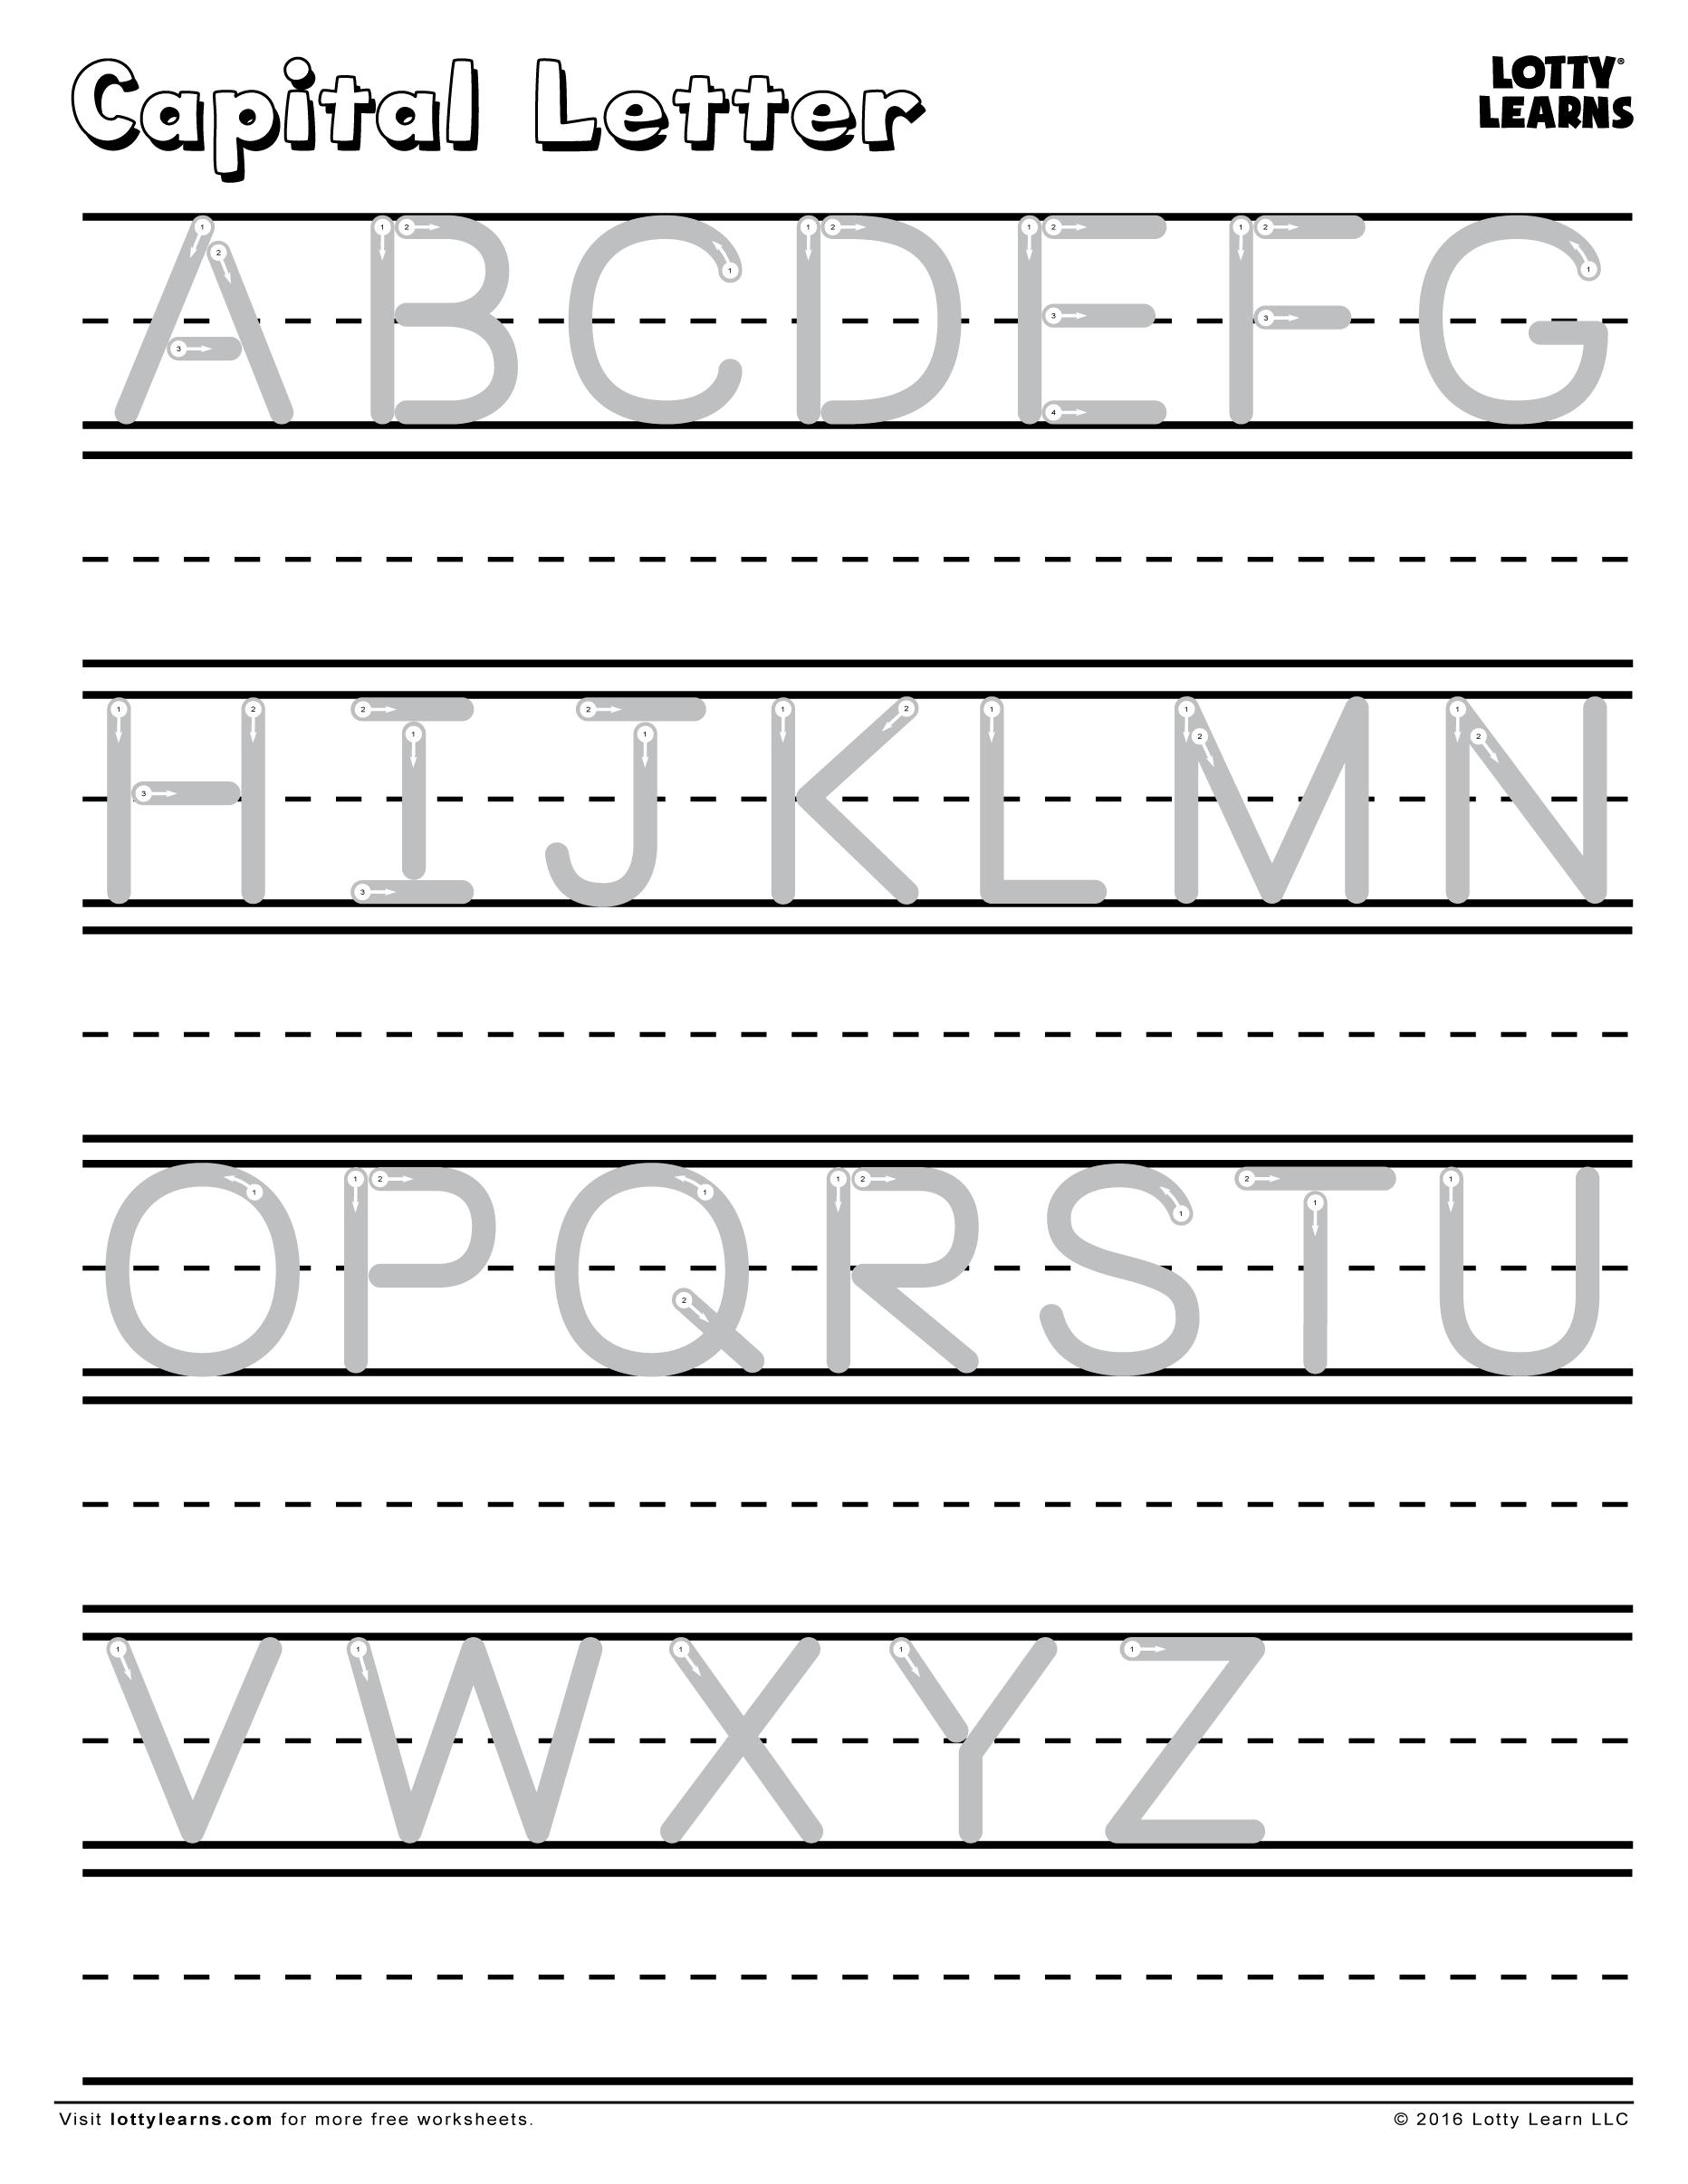 Capital Letter A-Z   Lotty Learns   Capital letters worksheet [ 2412 x 1864 Pixel ]